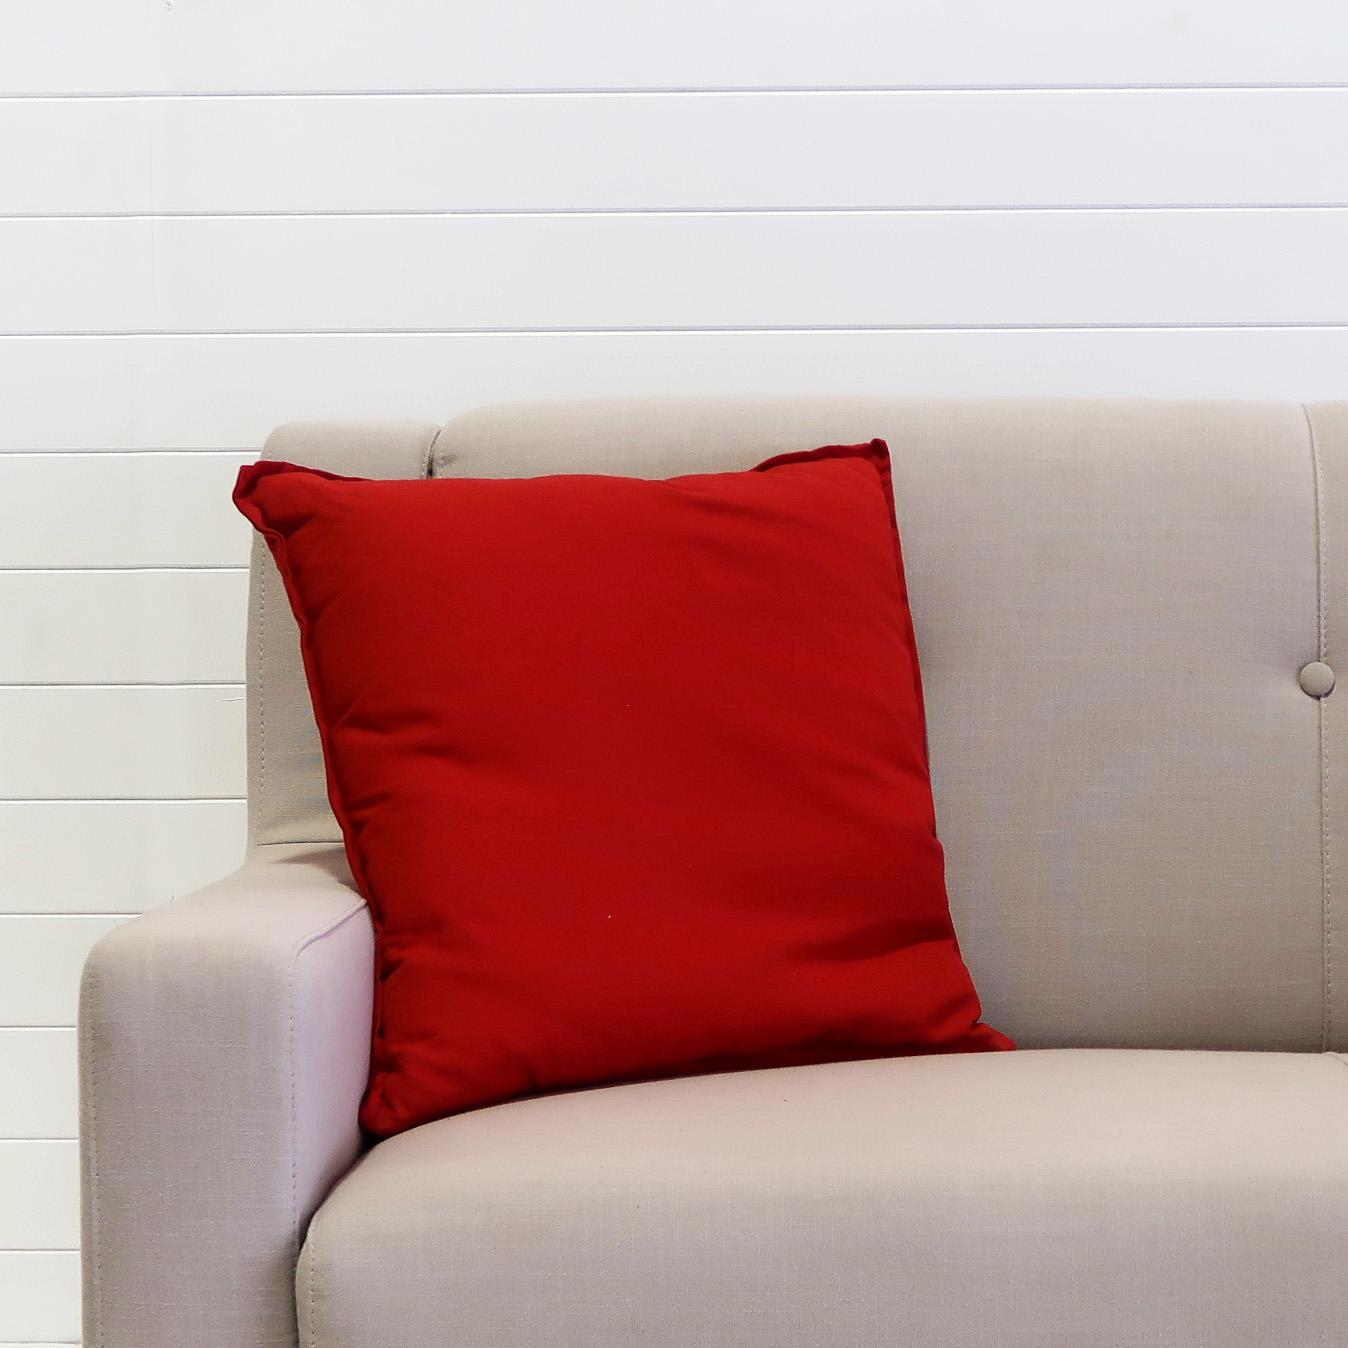 Cushion - Bright Red.JPG